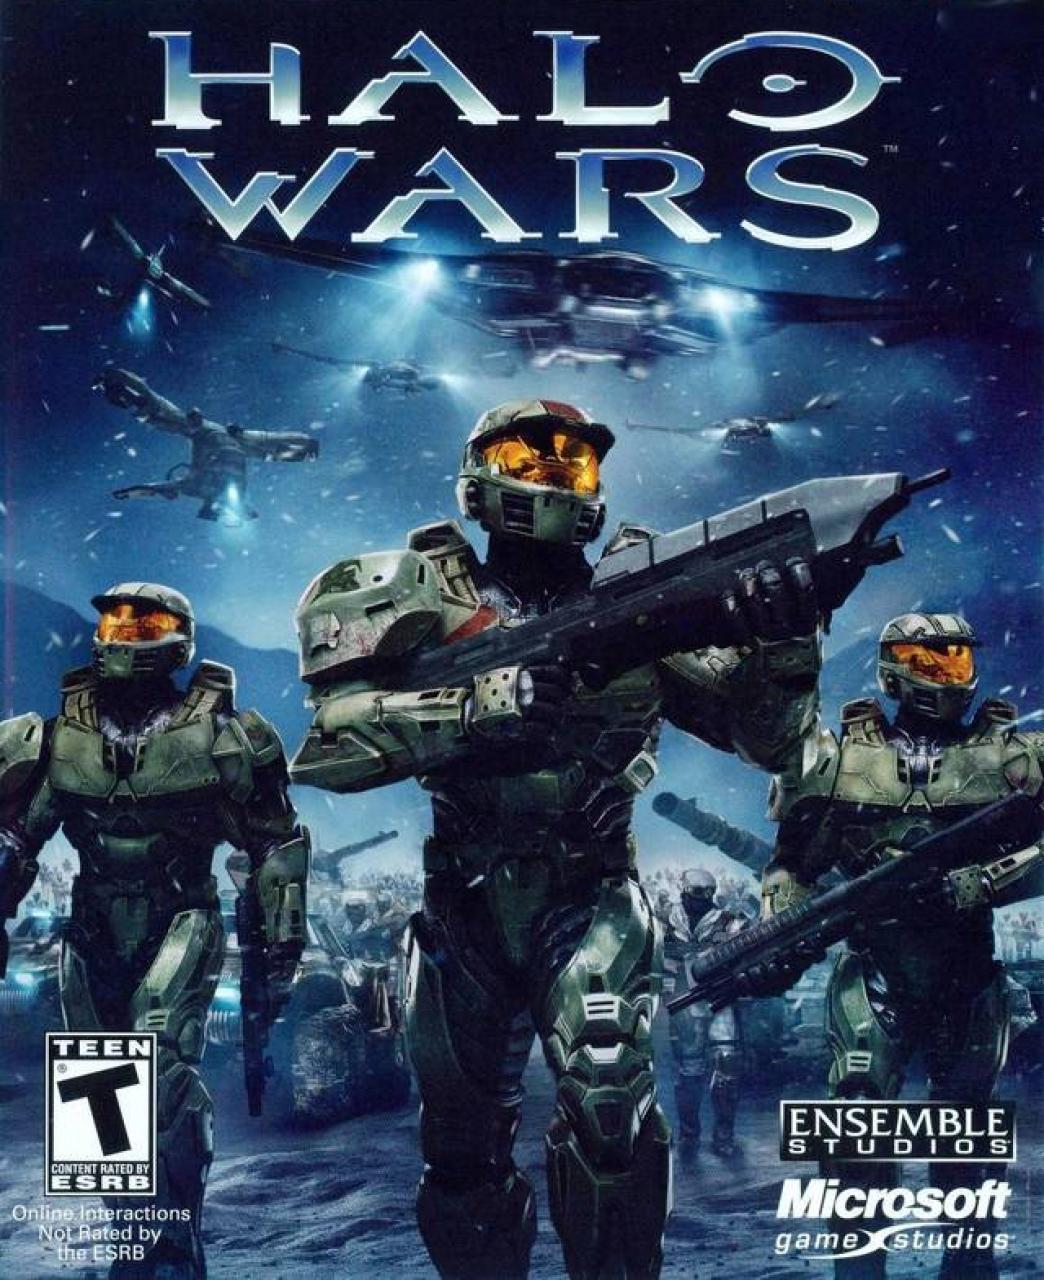 Halo Wars Video Game 2009 Imdb